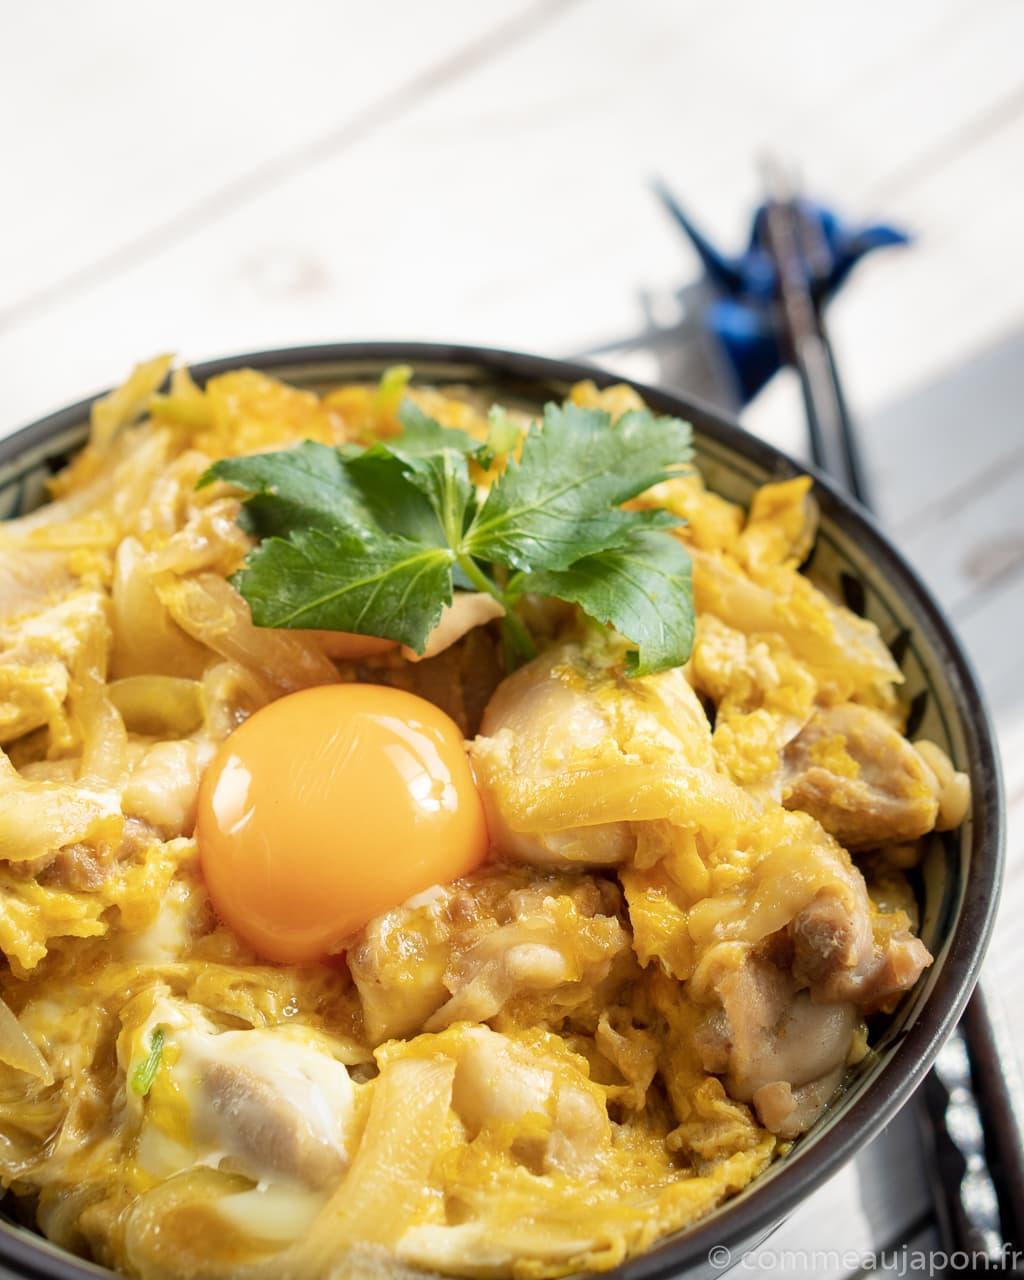 Oyakodon insta 1 of 1 Oyakodon - Bol de poulet et oeuf - 親子丼